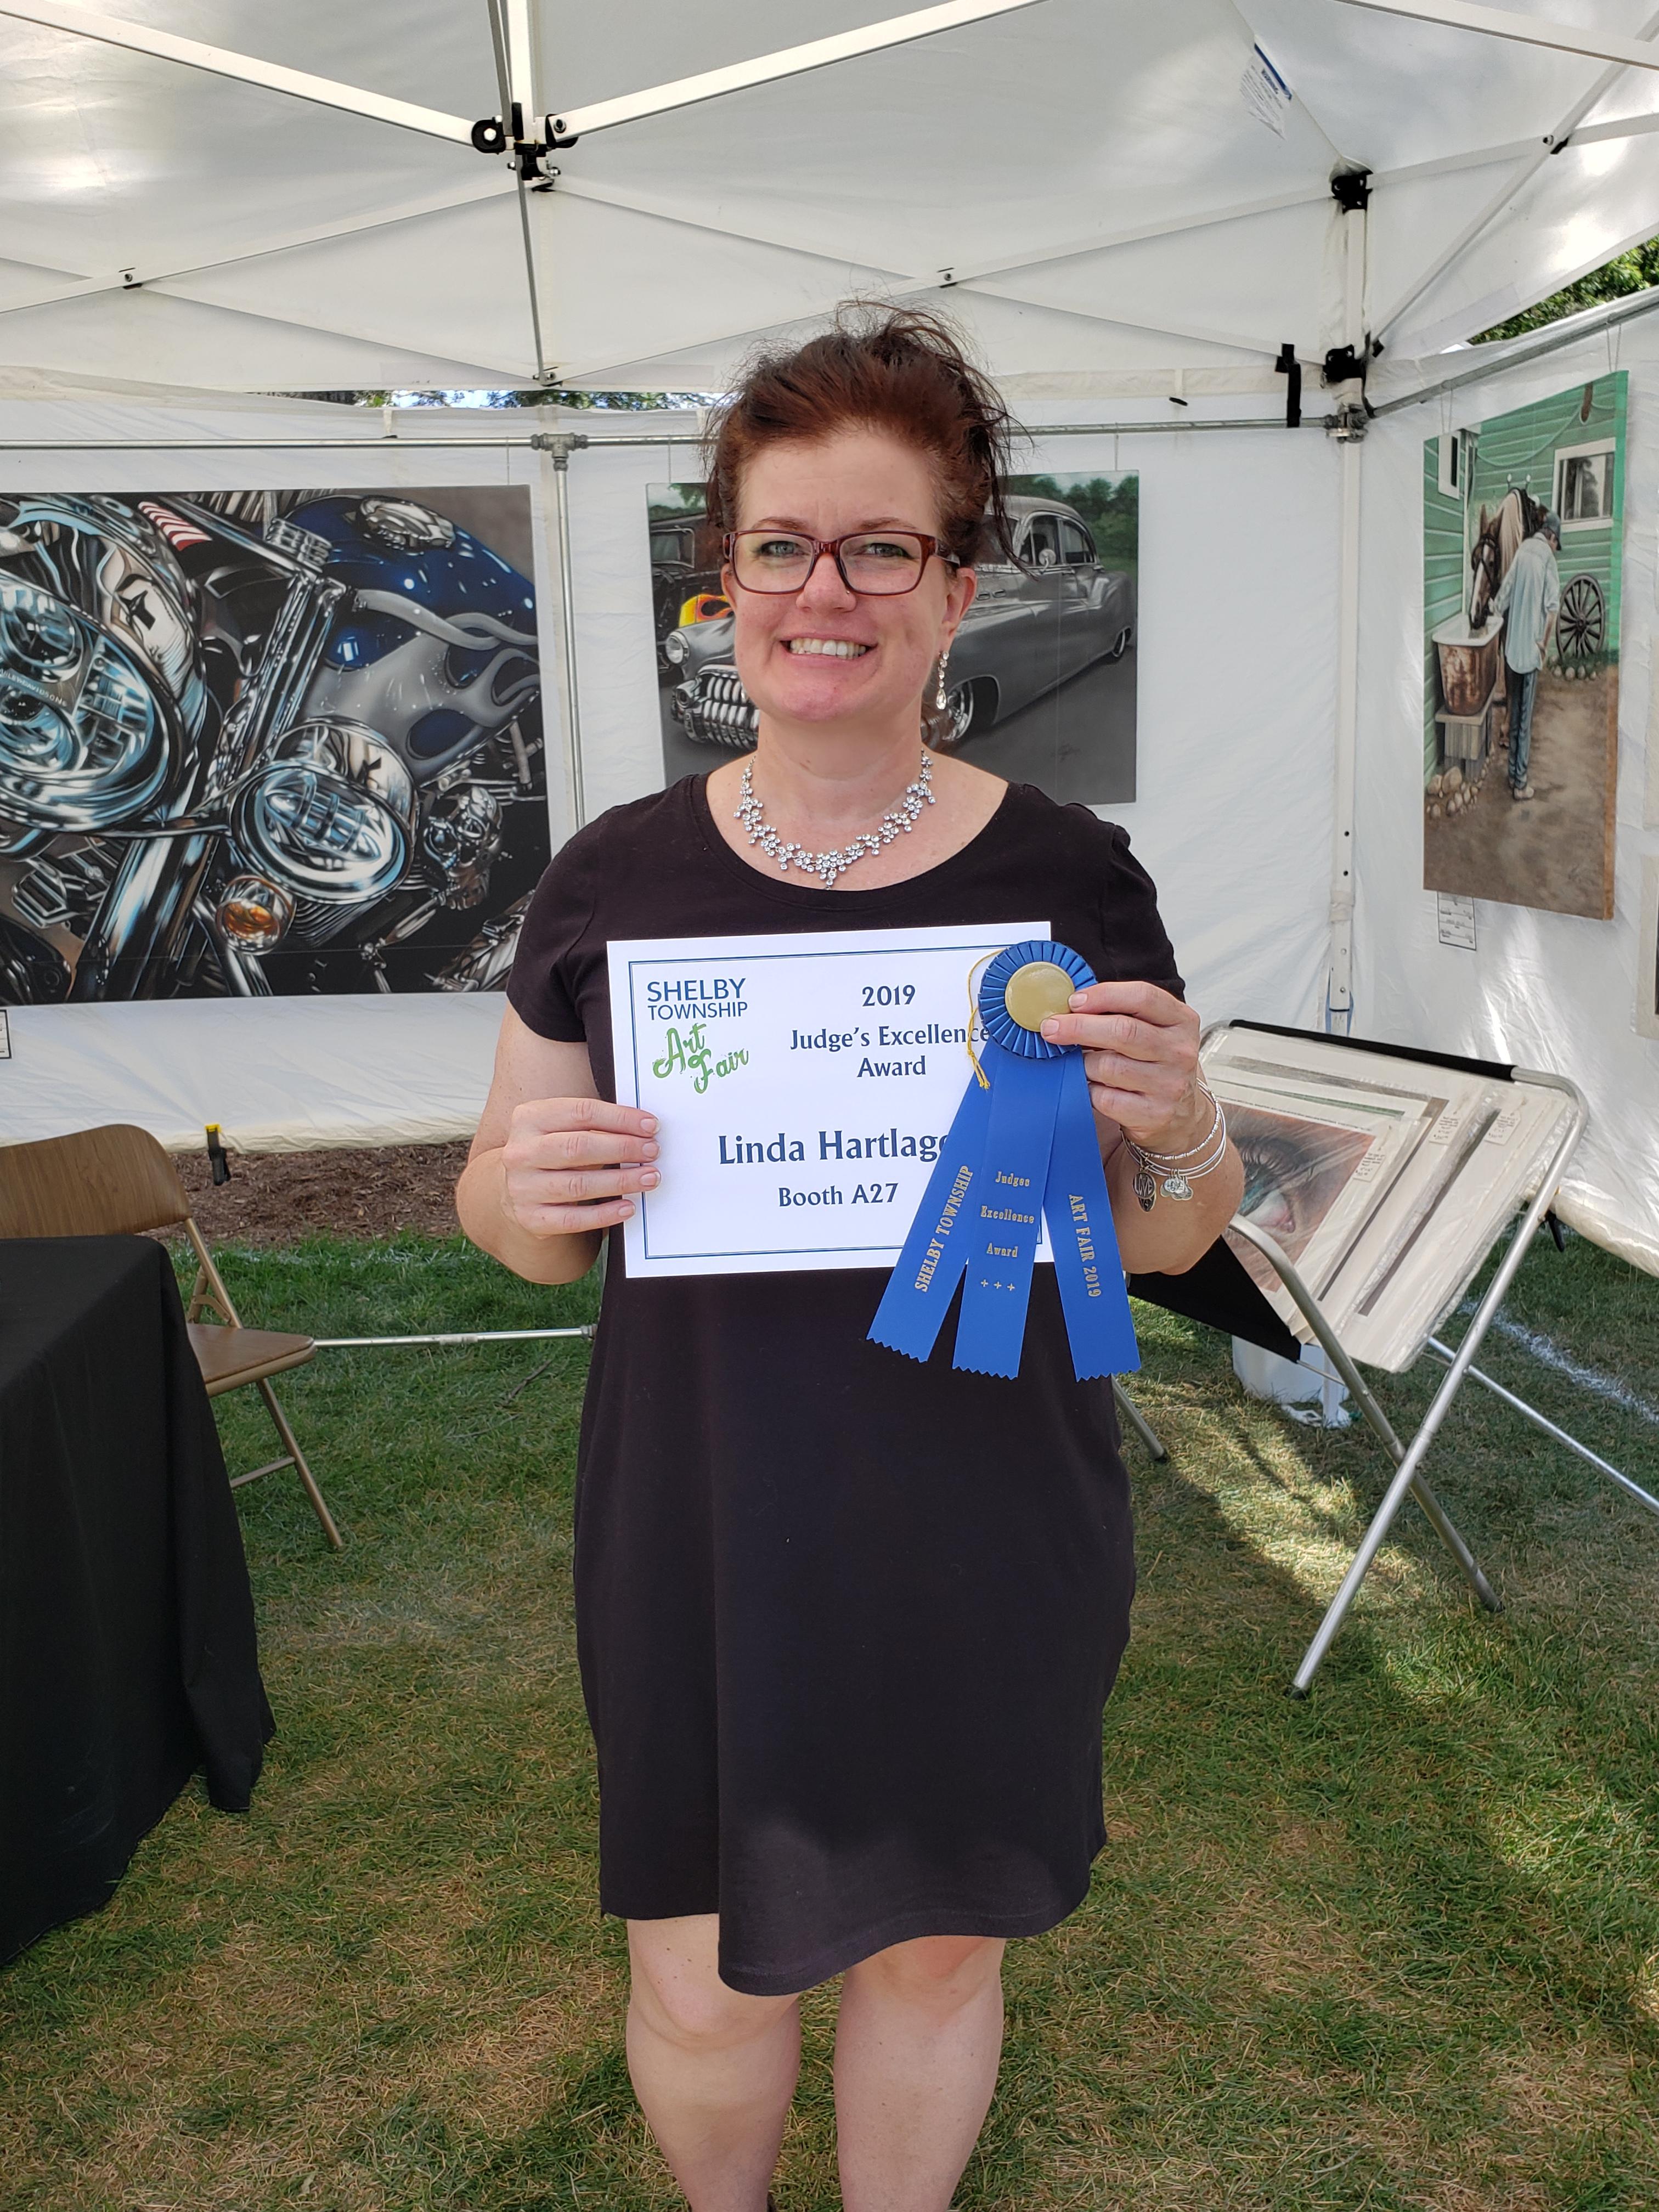 Excellence Award - Linda Hartlage